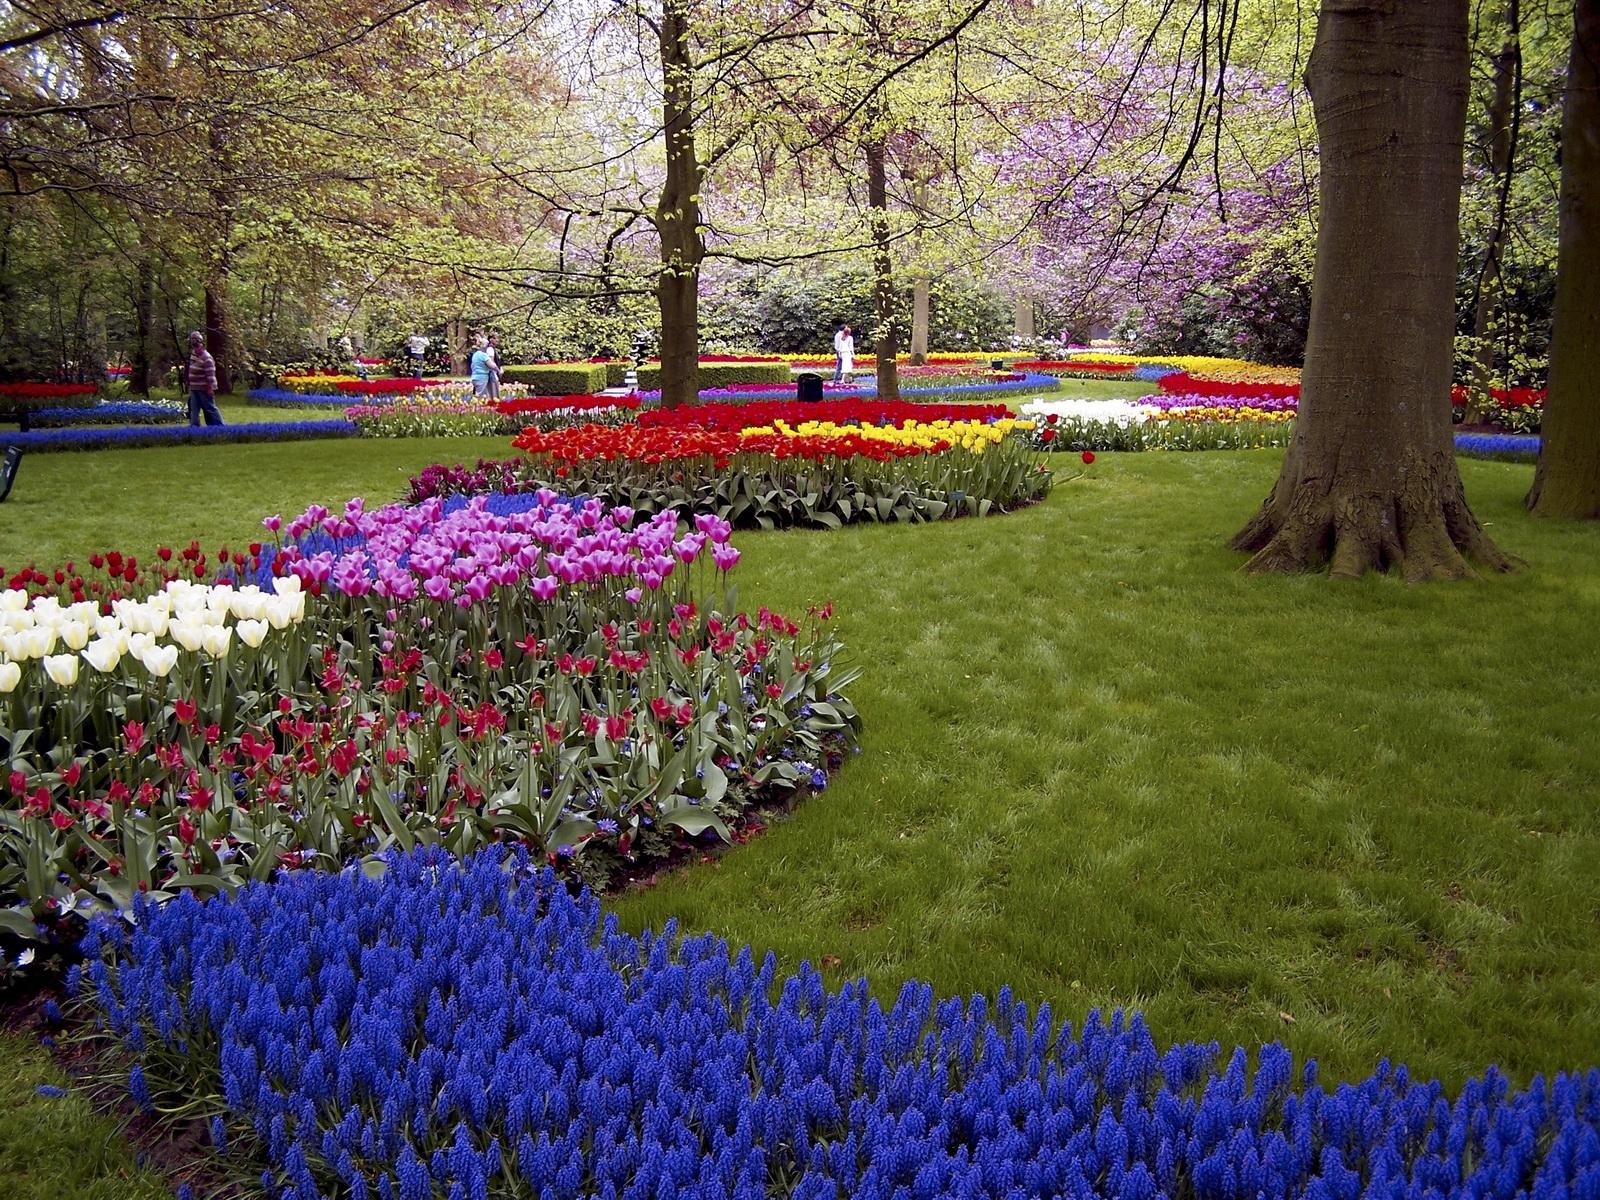 картинки газон с цветами познакомилась